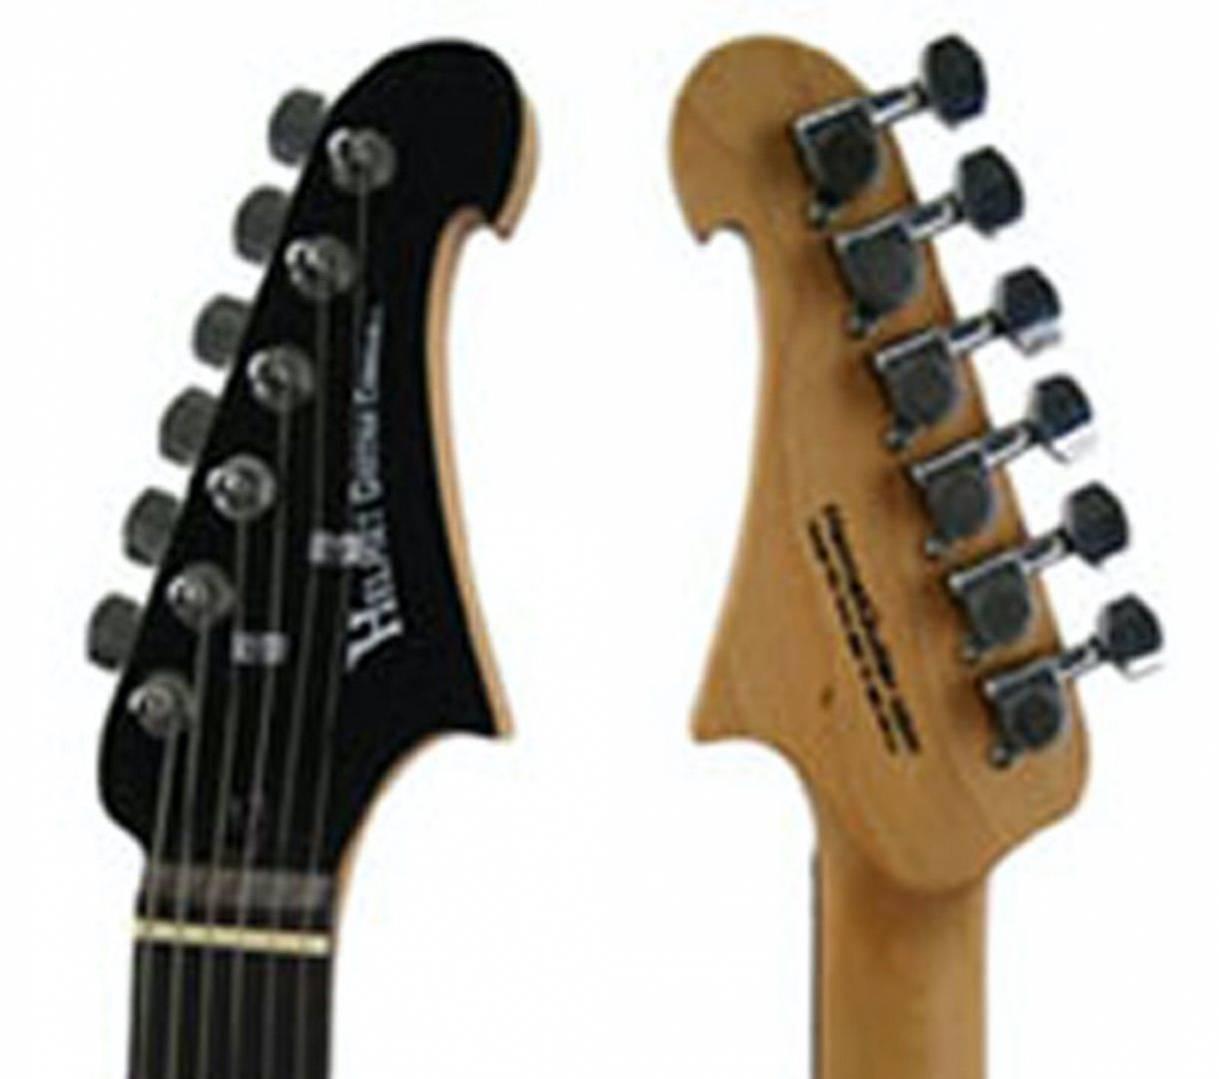 Via Trading | Liquidation of New Overstock Helmet Guitars